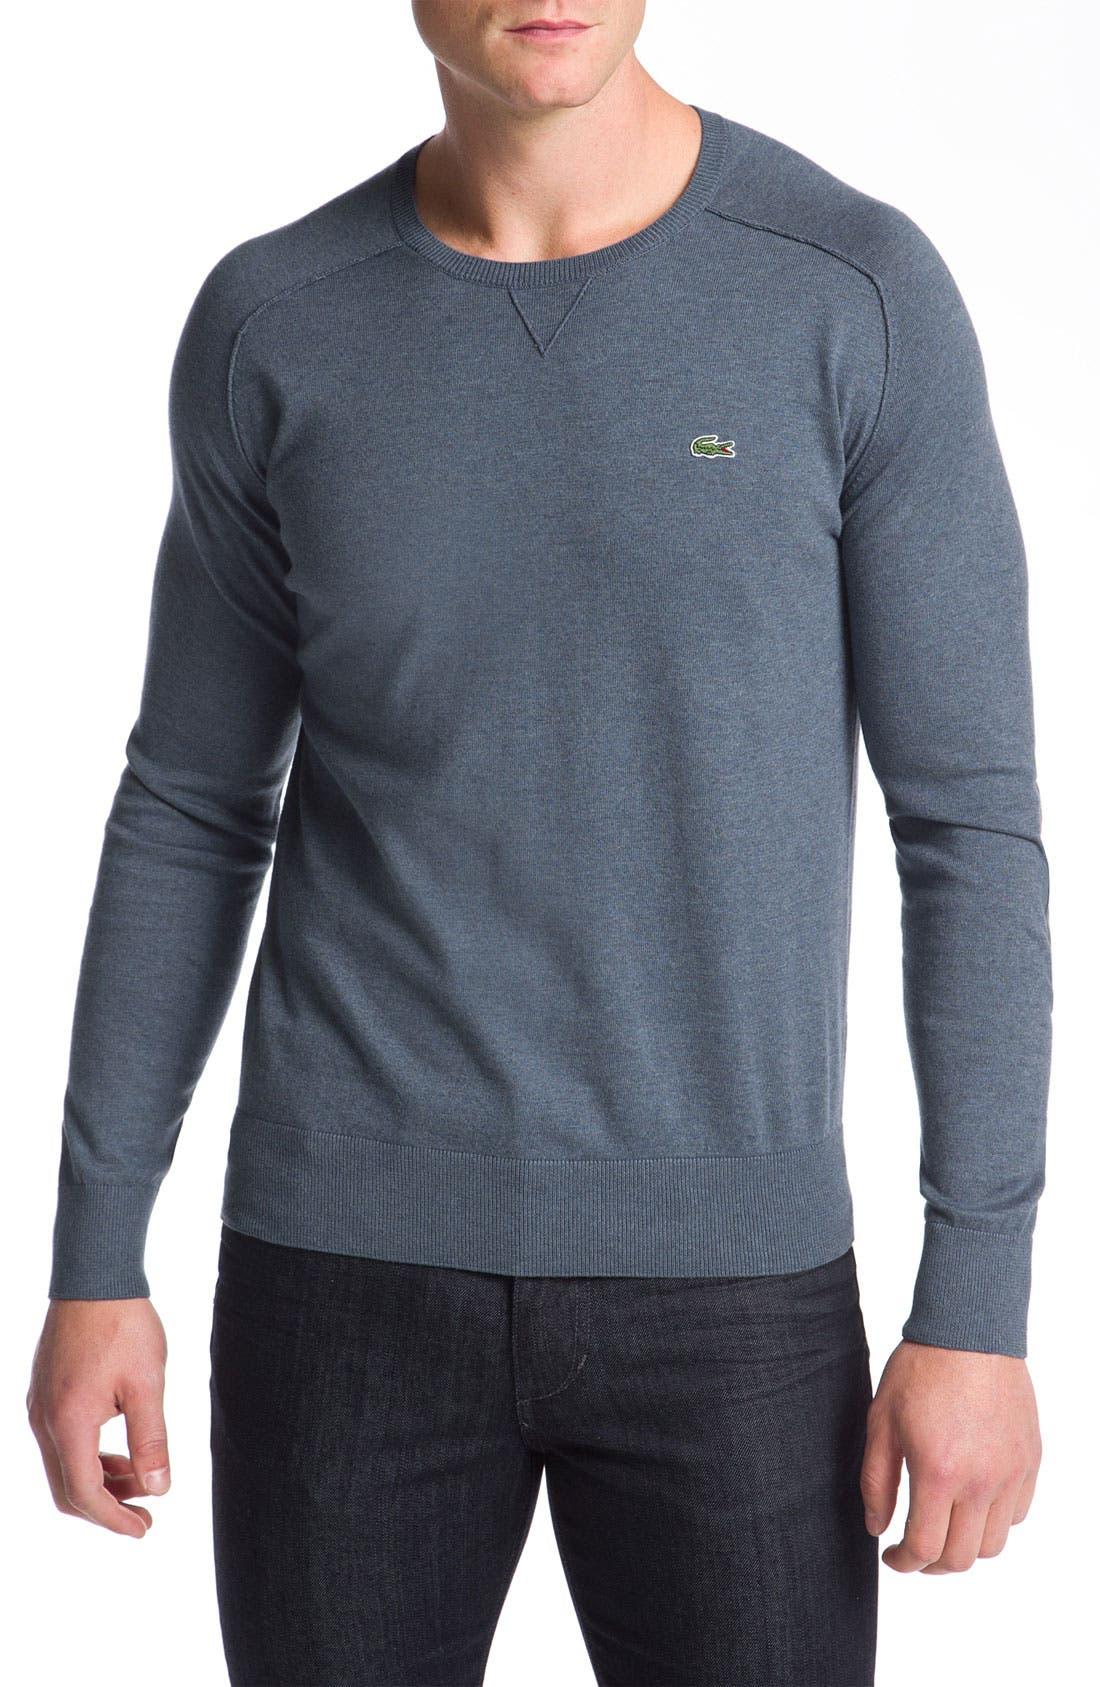 Main Image - Lacoste Cotton & Cashmere Crewneck Sweater